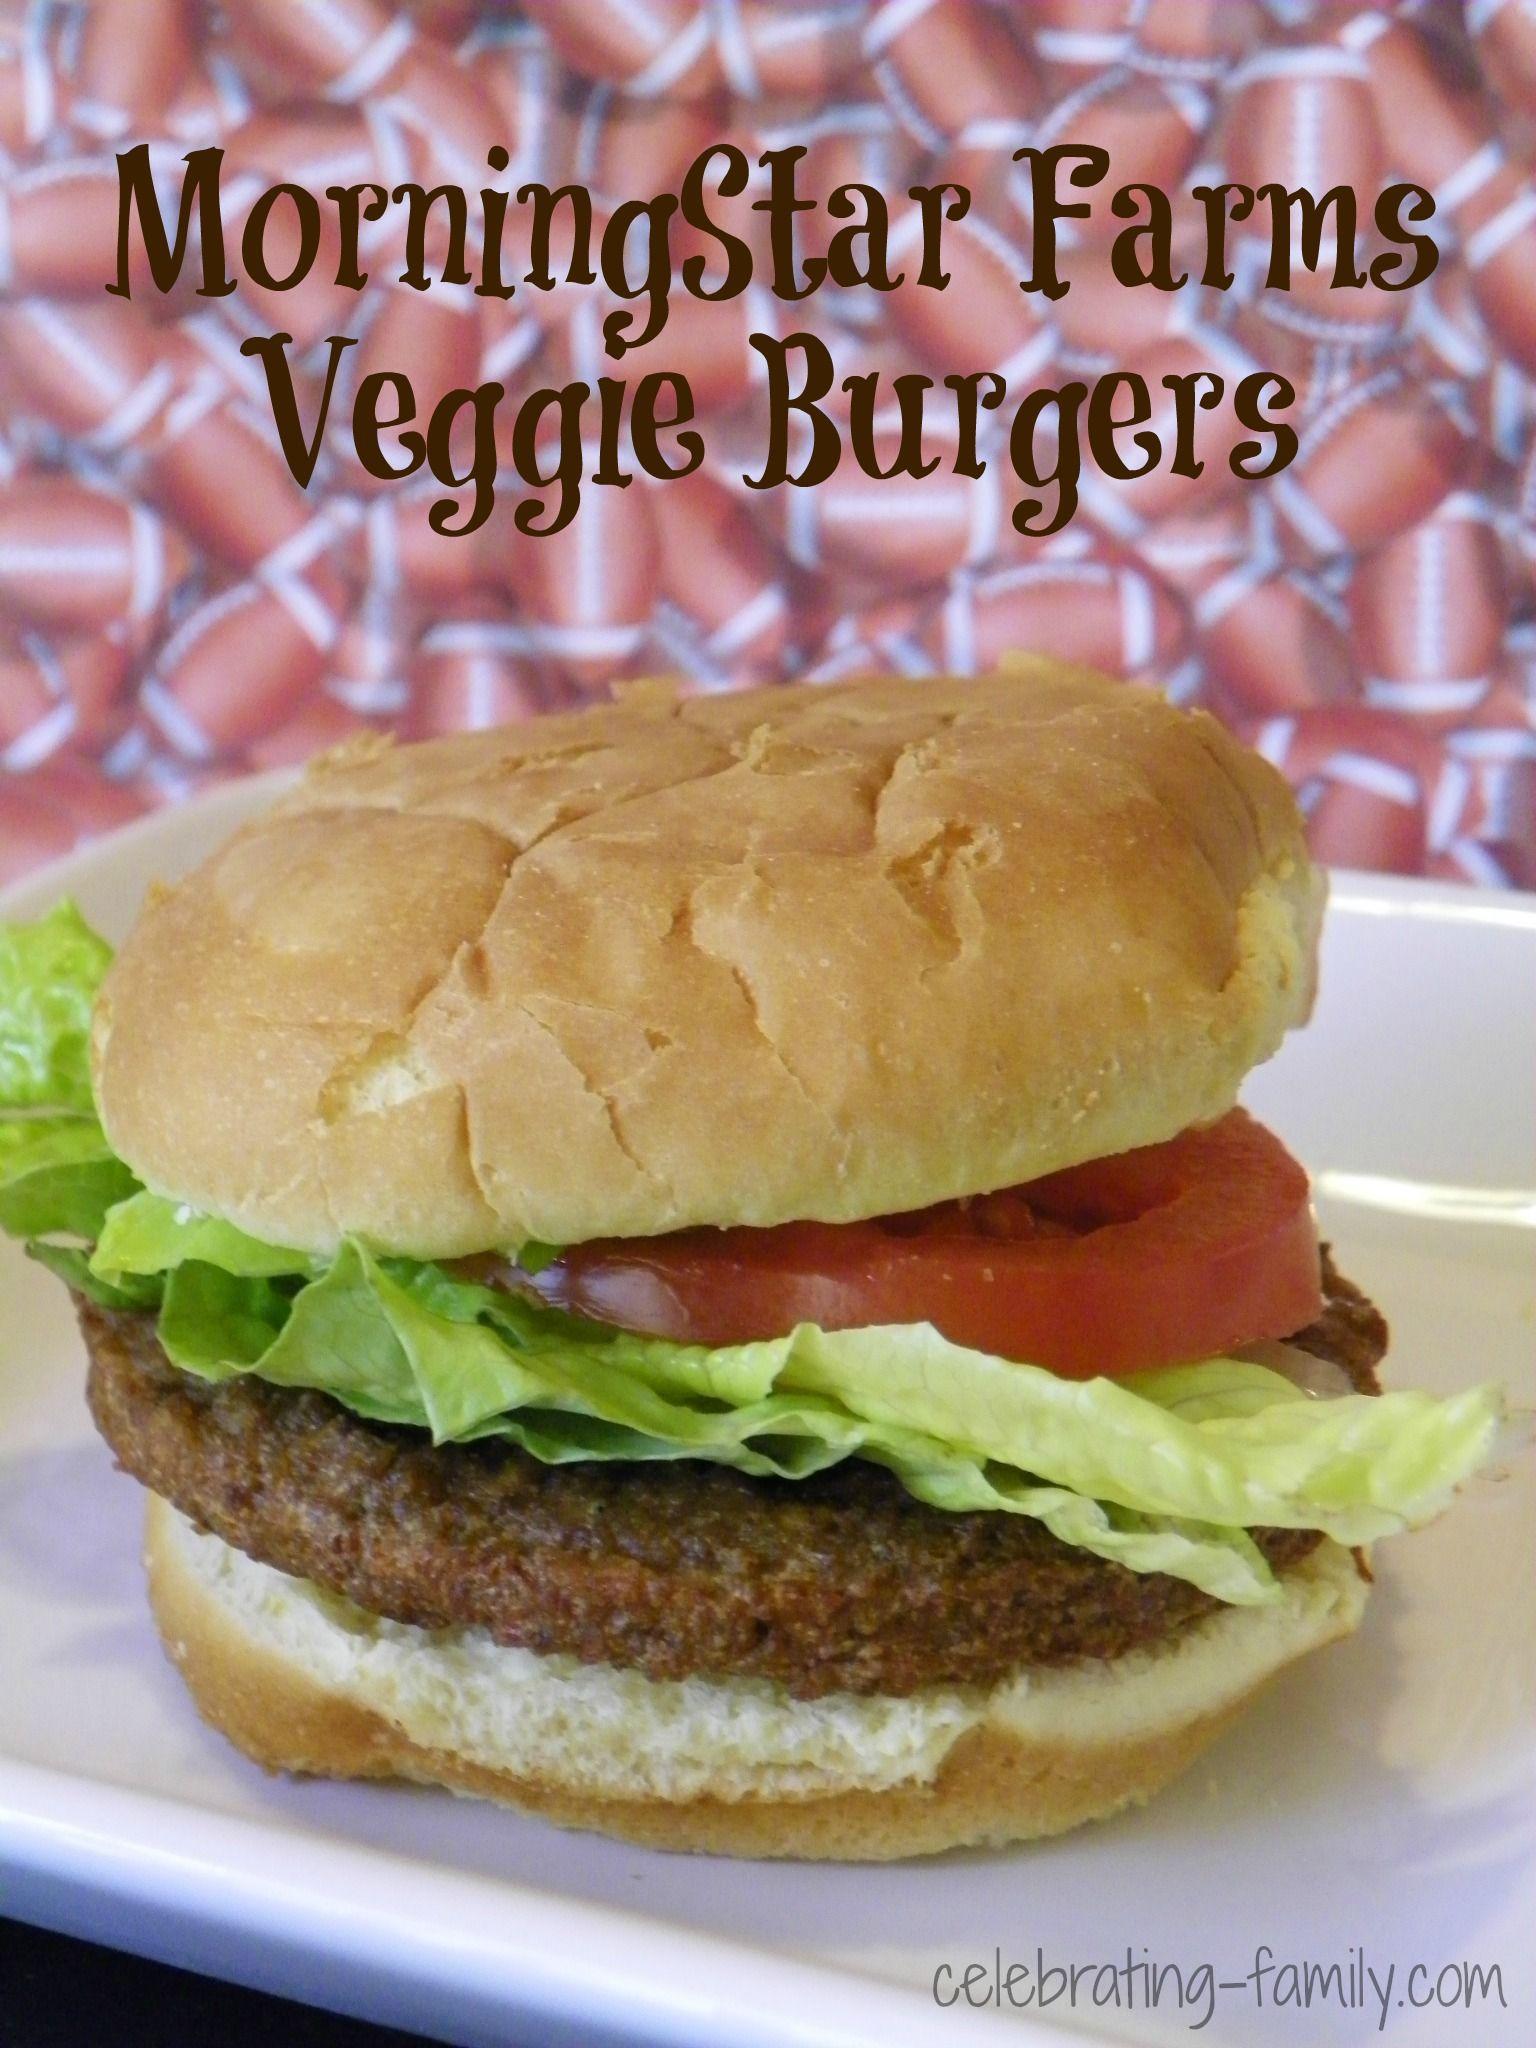 Morningstar Farms Veggie Burgers Food Pinterest Veggie Burgers